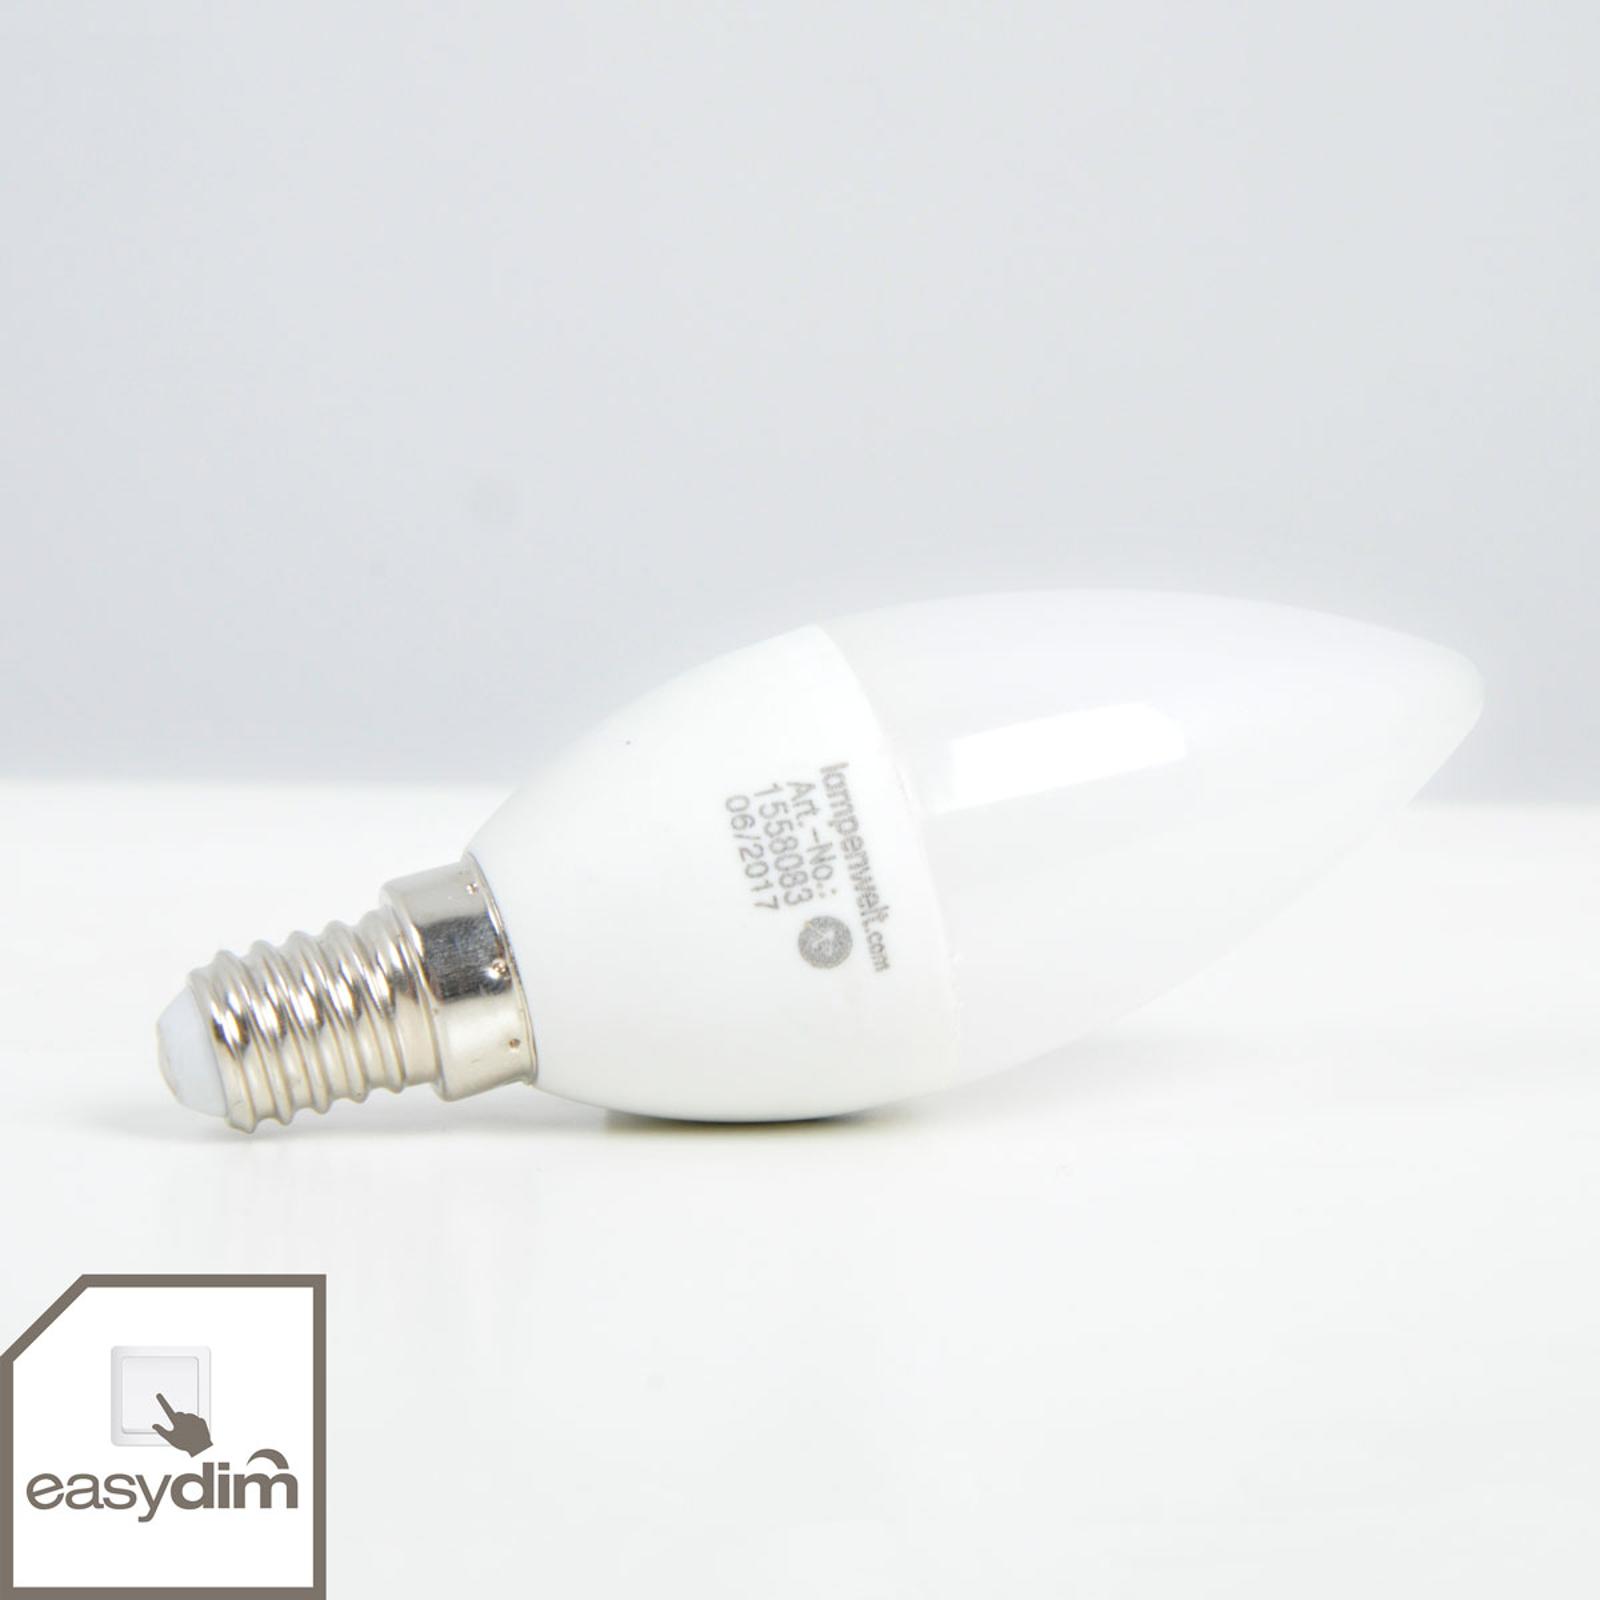 LED-Kerzenlampe E14 5W, warmweiß, easydim